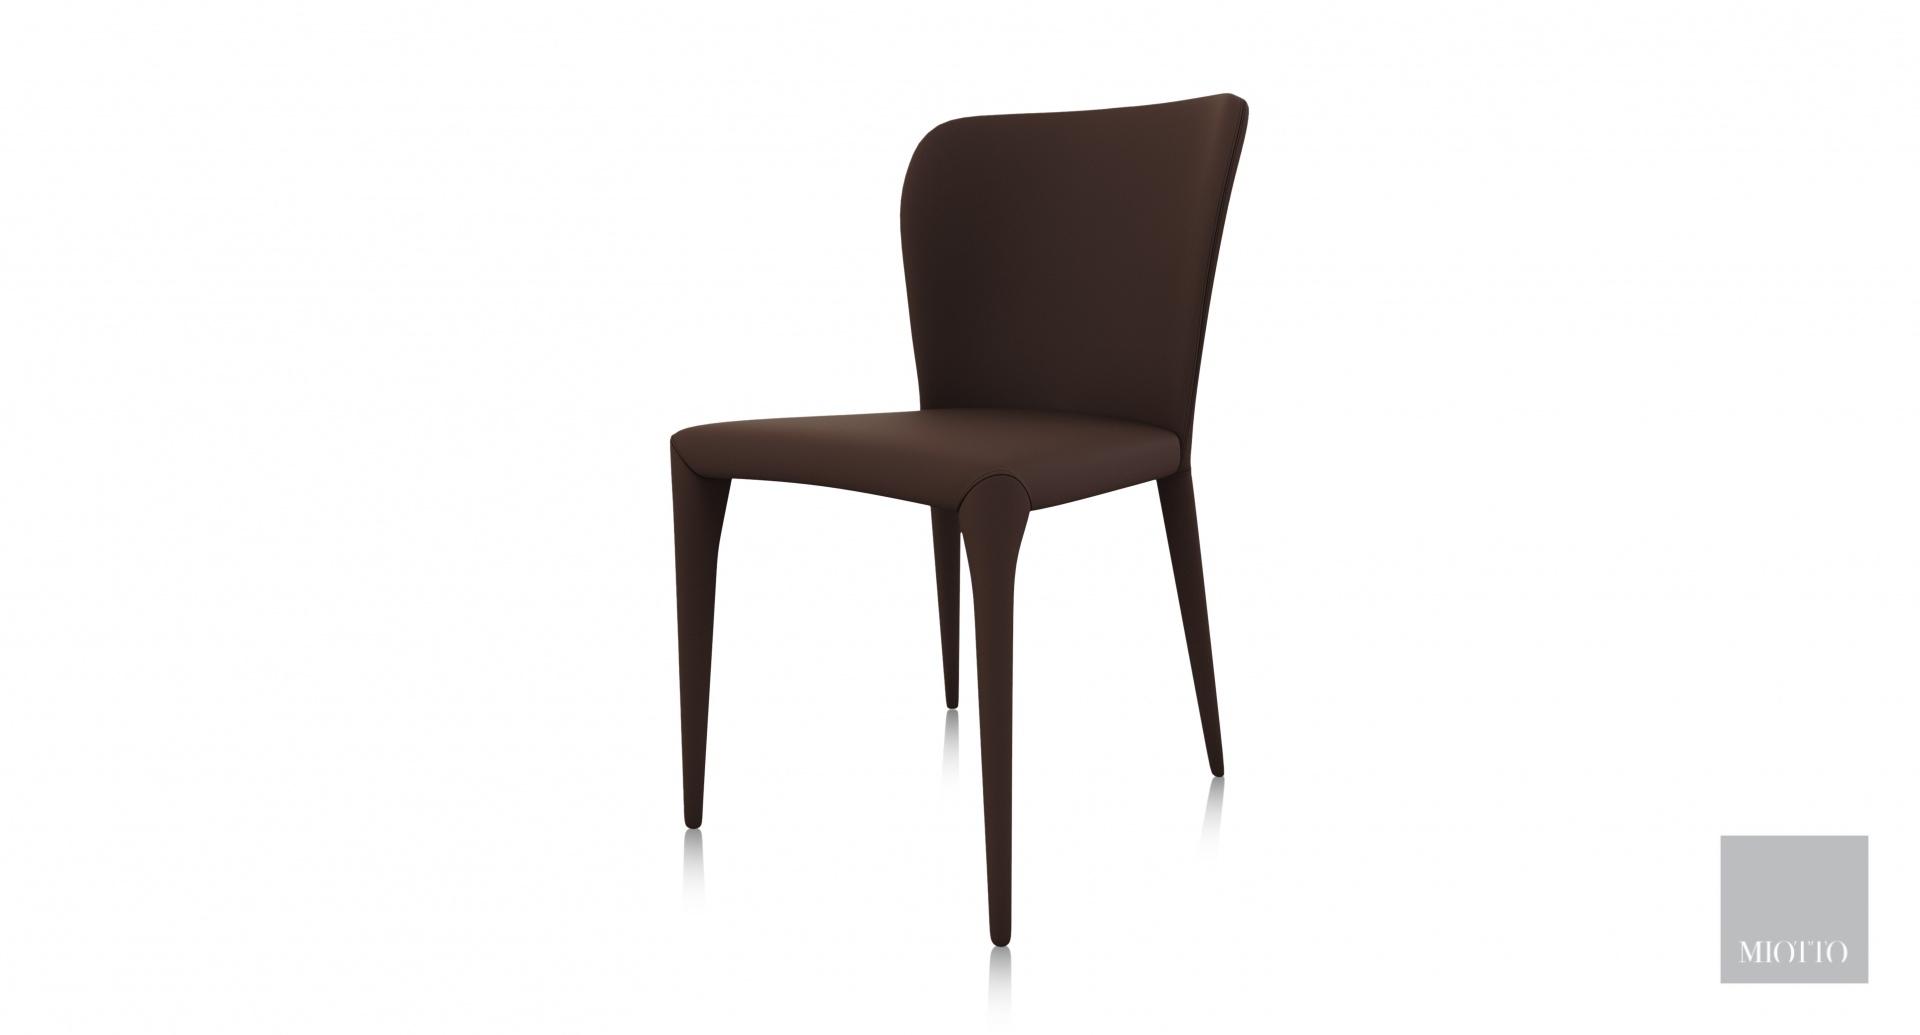 miotto_pavia DC dark brown T miotto design furniture